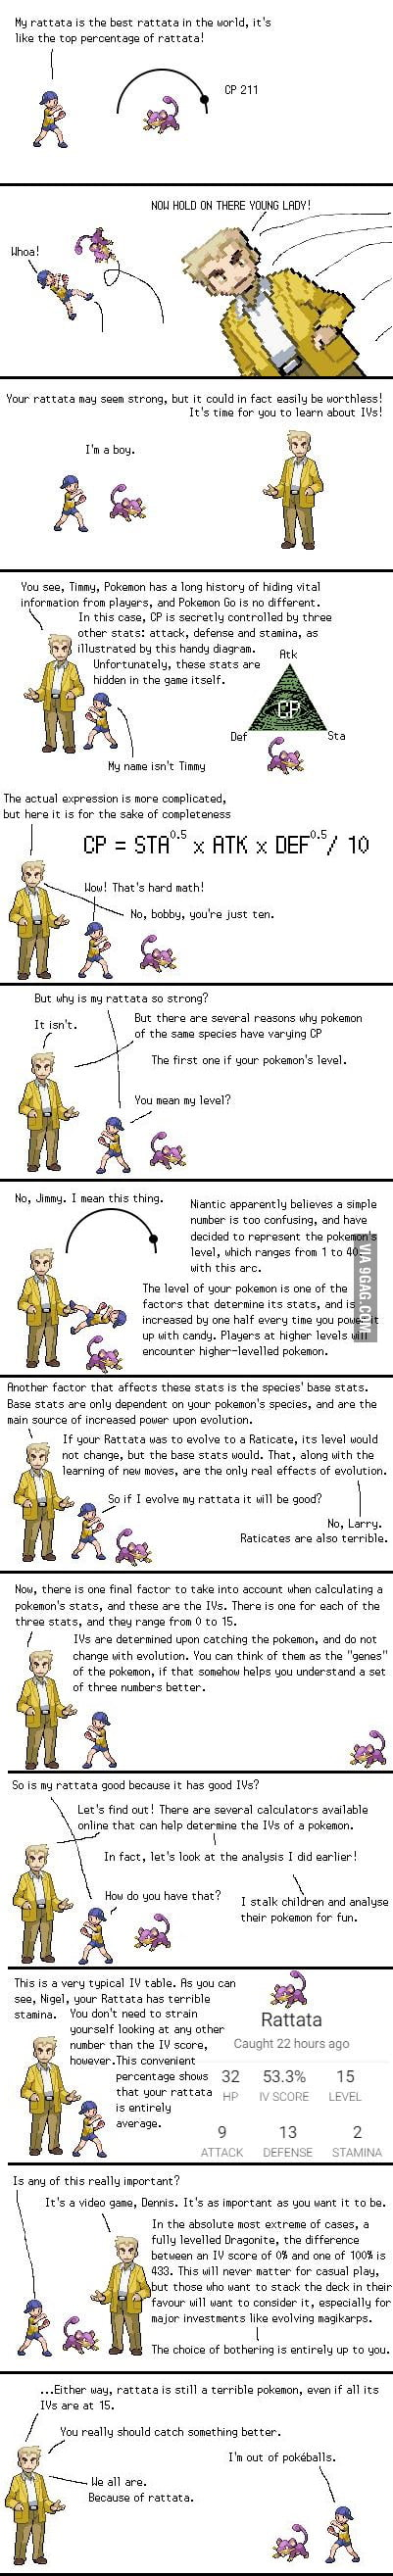 The Pokemon Go IV system explained - 9GAG